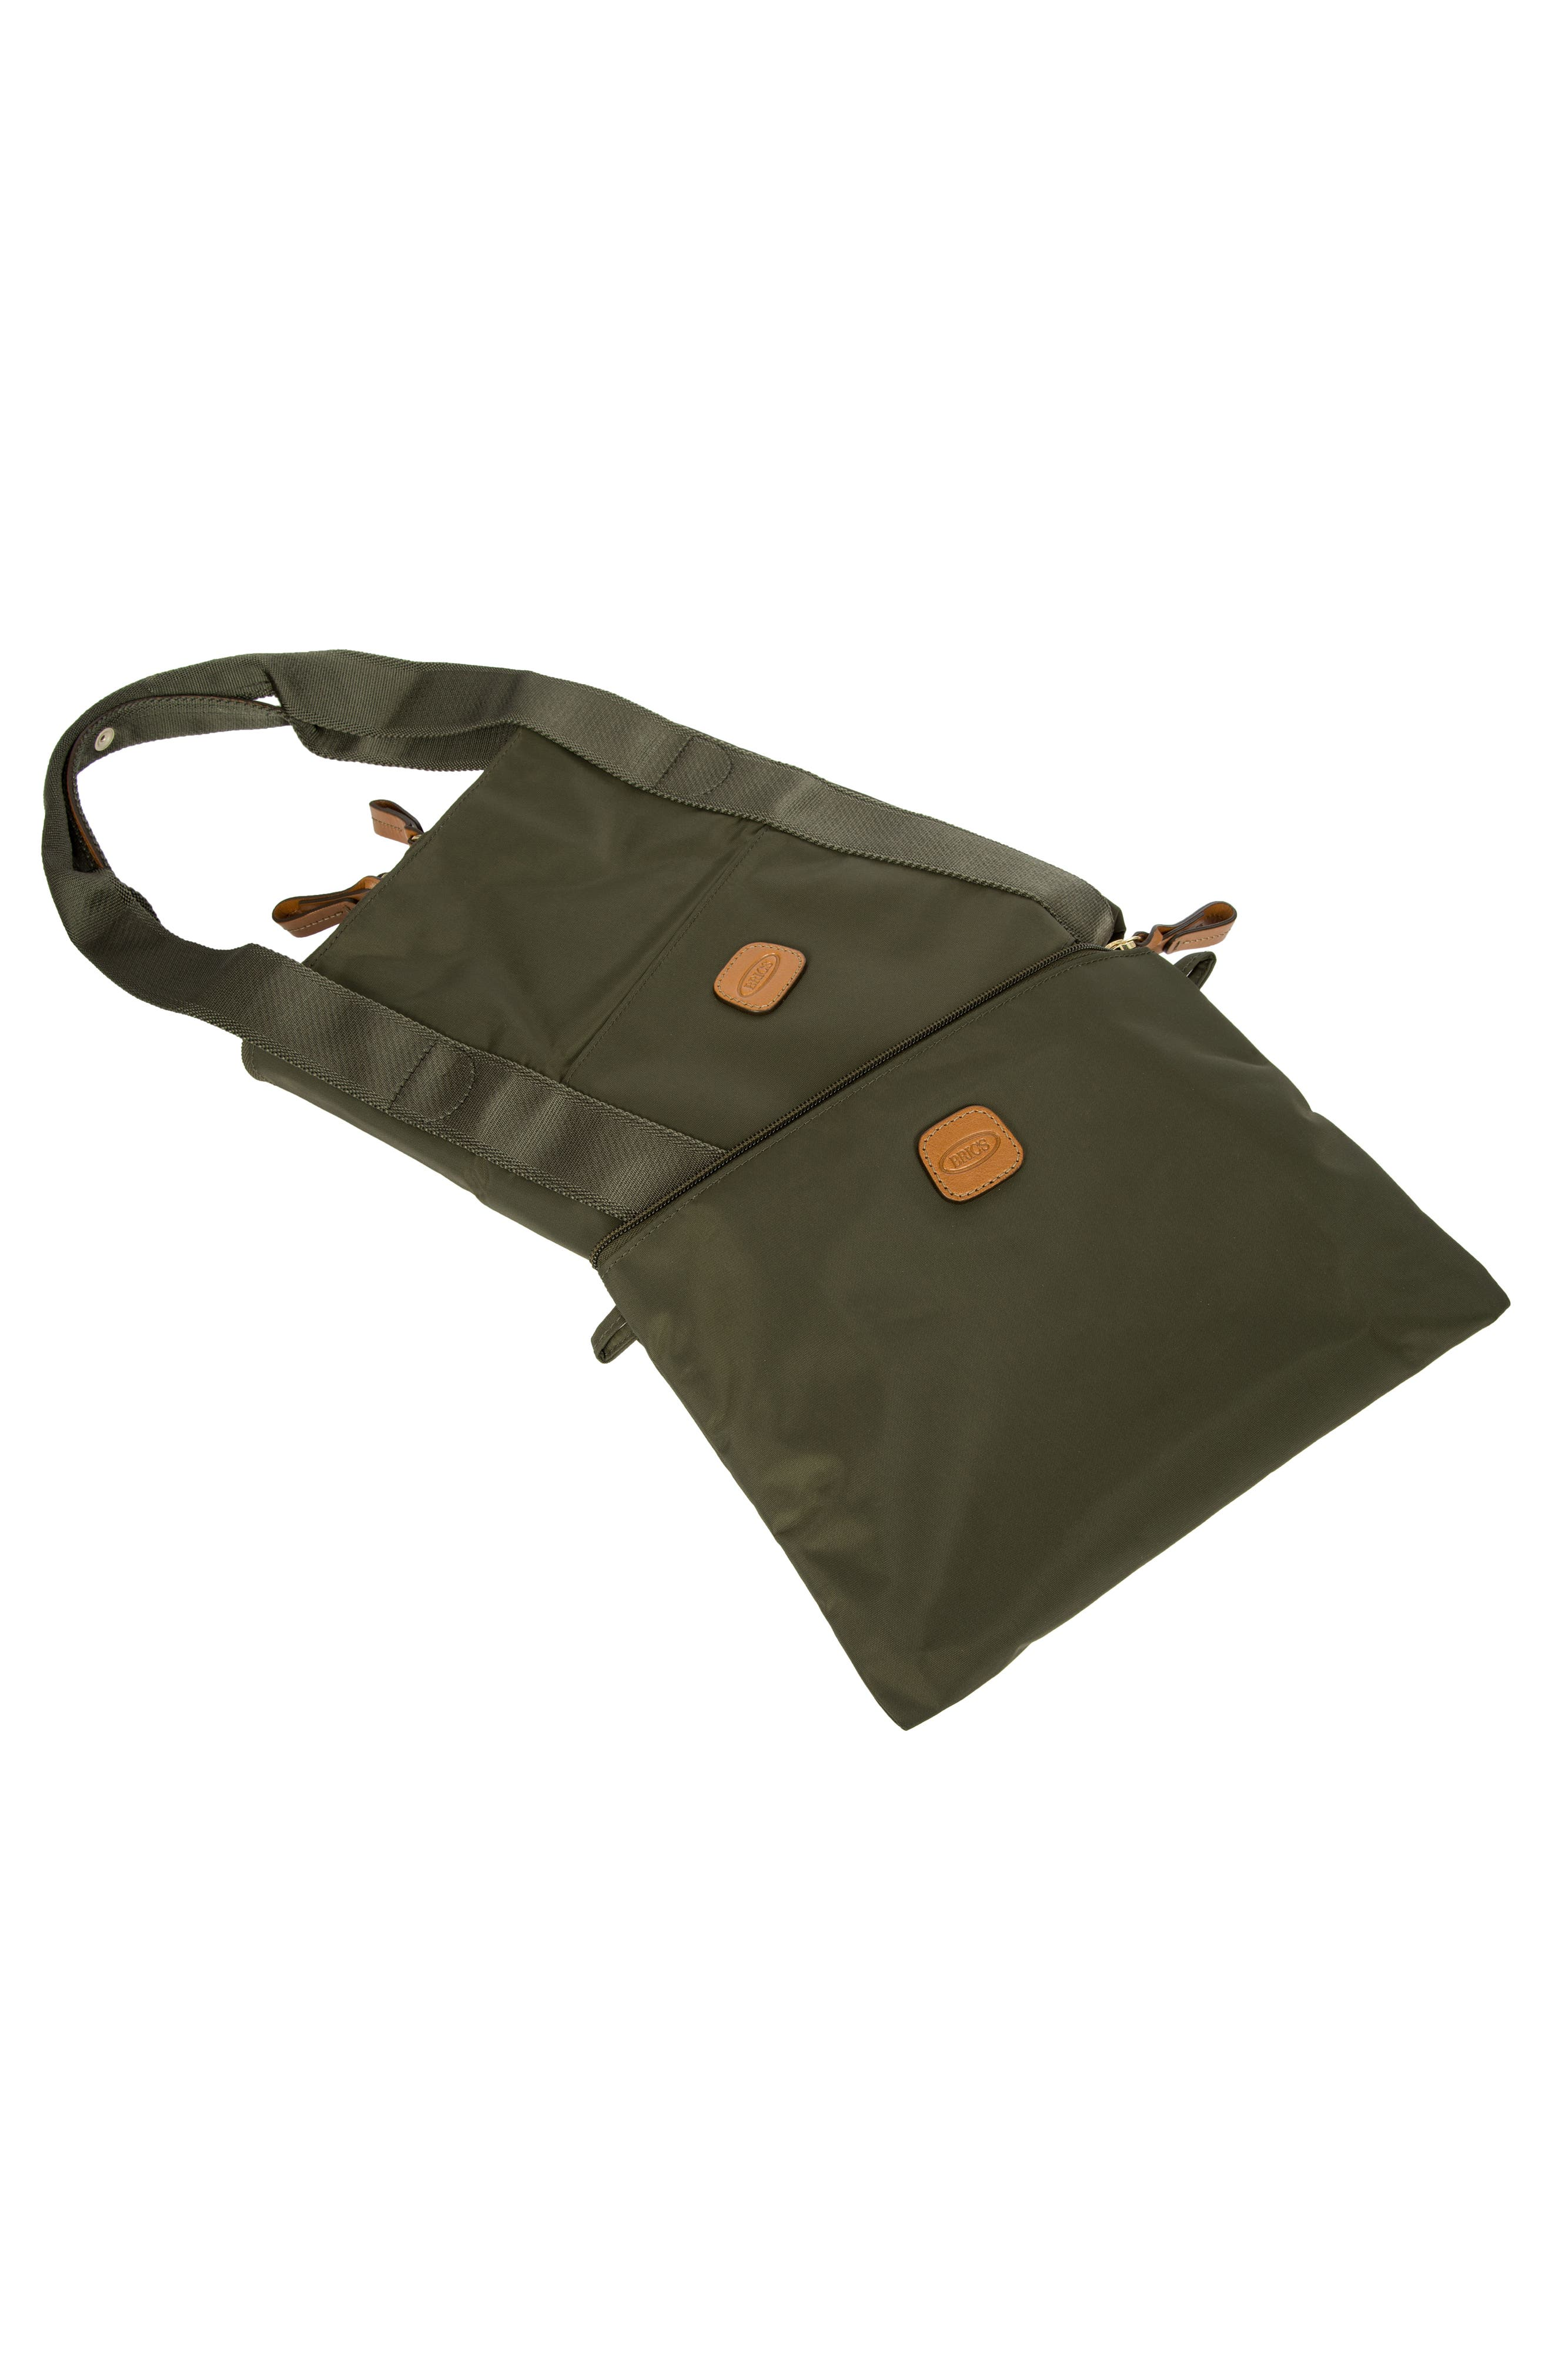 X-Bag 18-Inch Folding Duffel Bag,                             Alternate thumbnail 4, color,                             Olive